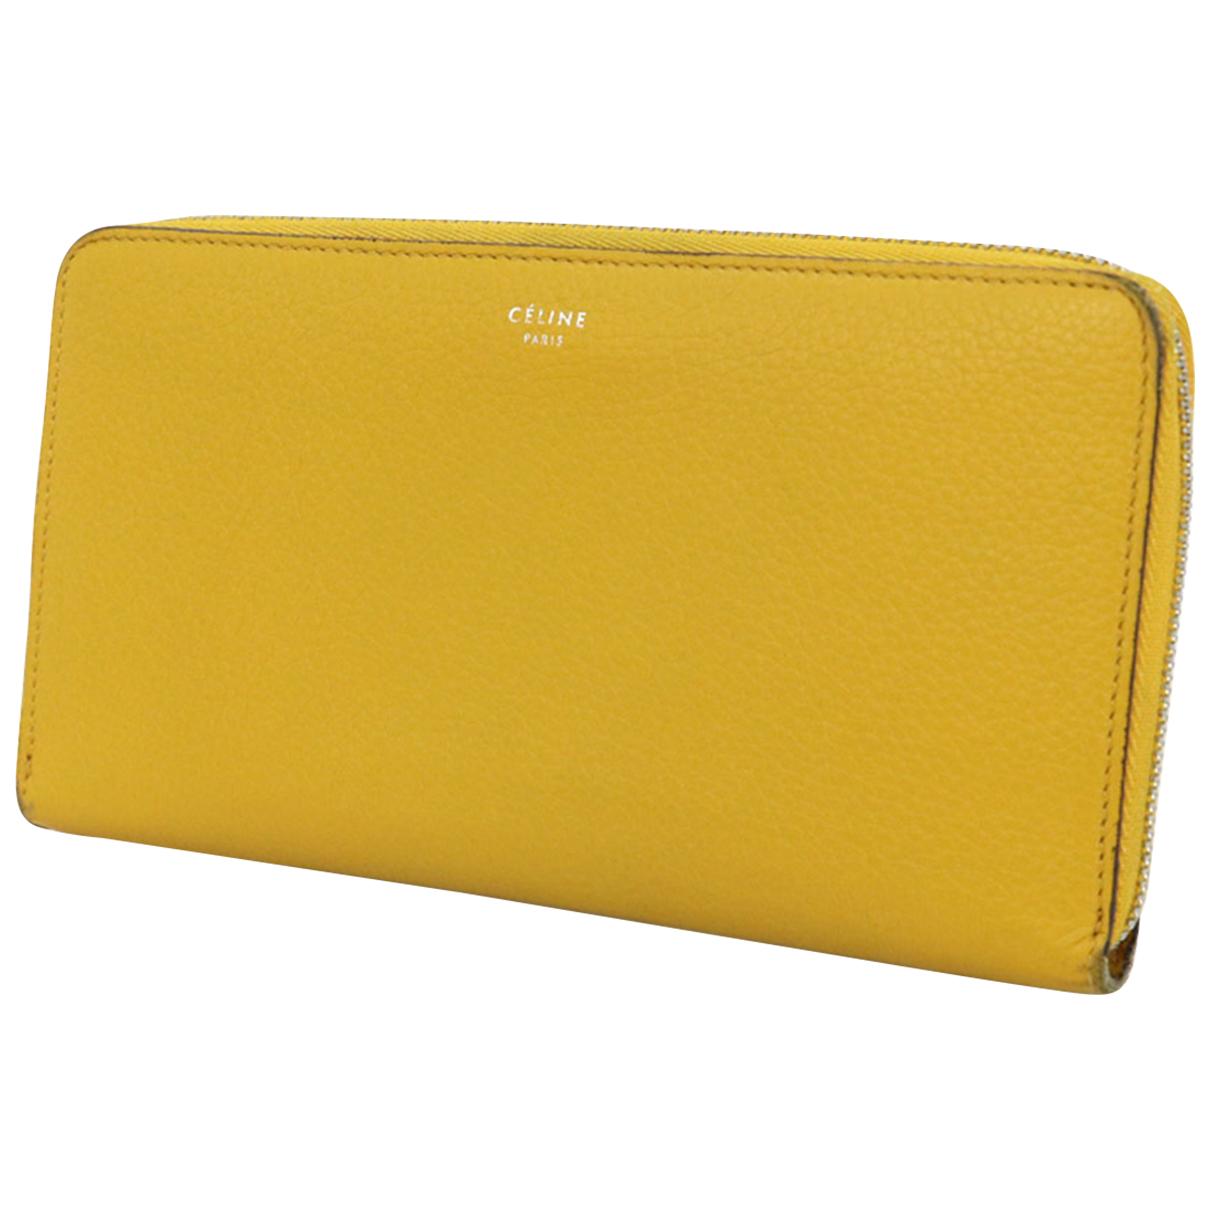 Celine N Yellow Leather wallet for Women N